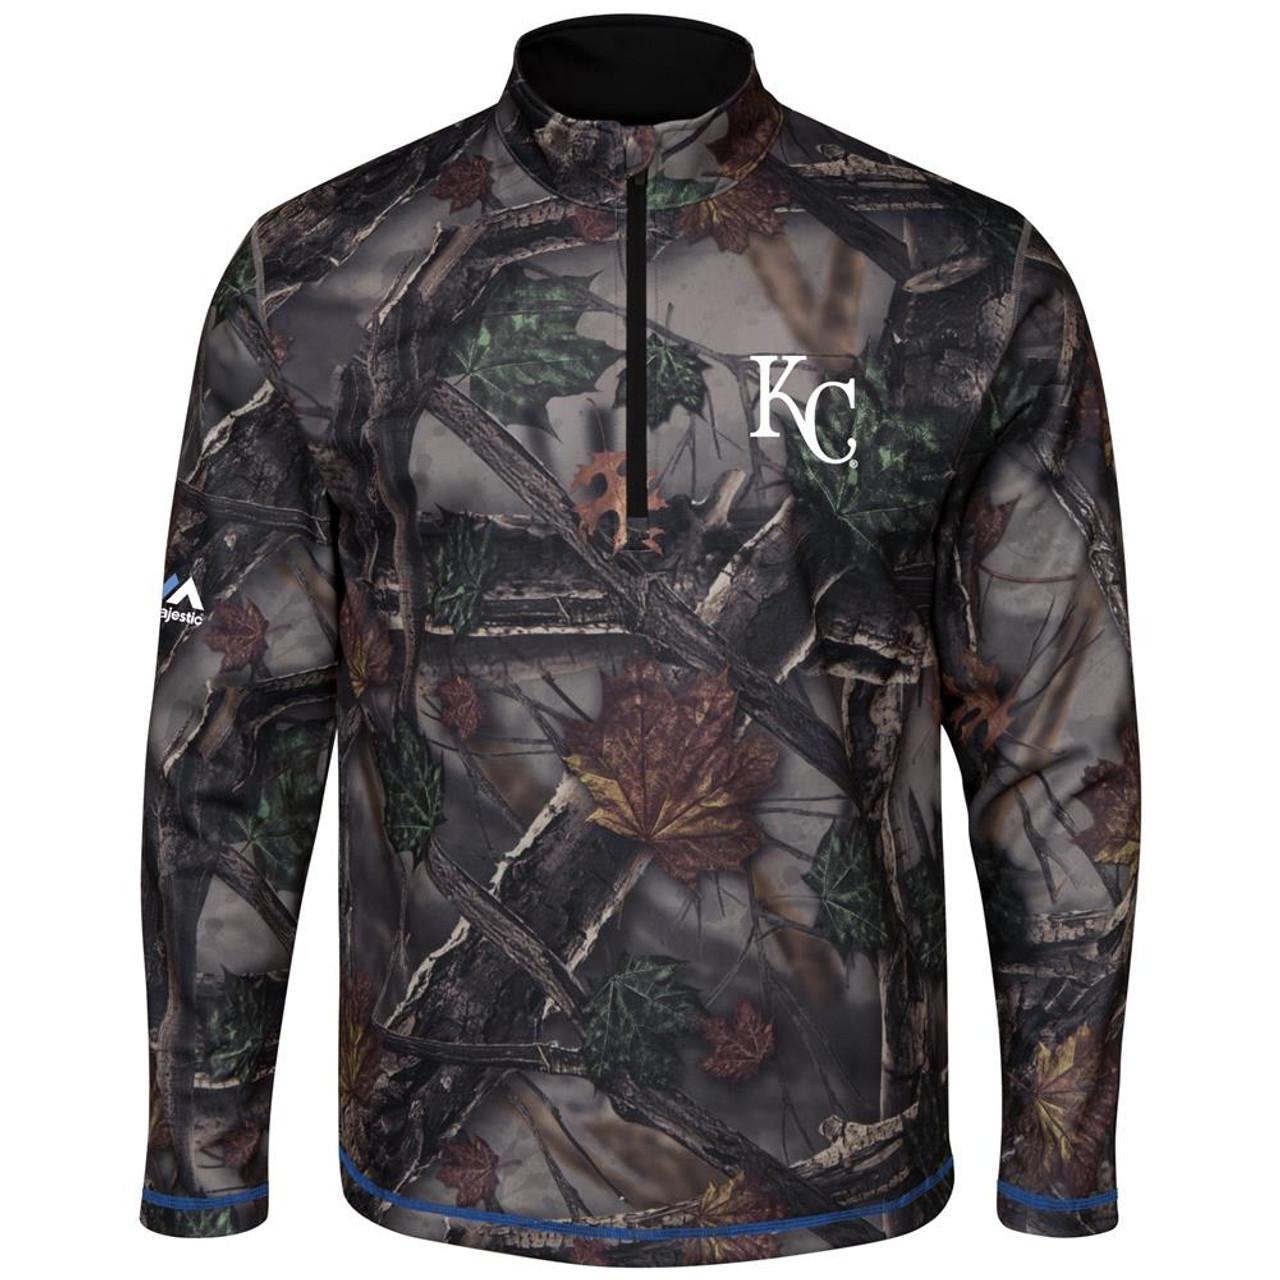 The Woods Majestic Kansas City Royals Camo 1/2 Zip Jacket